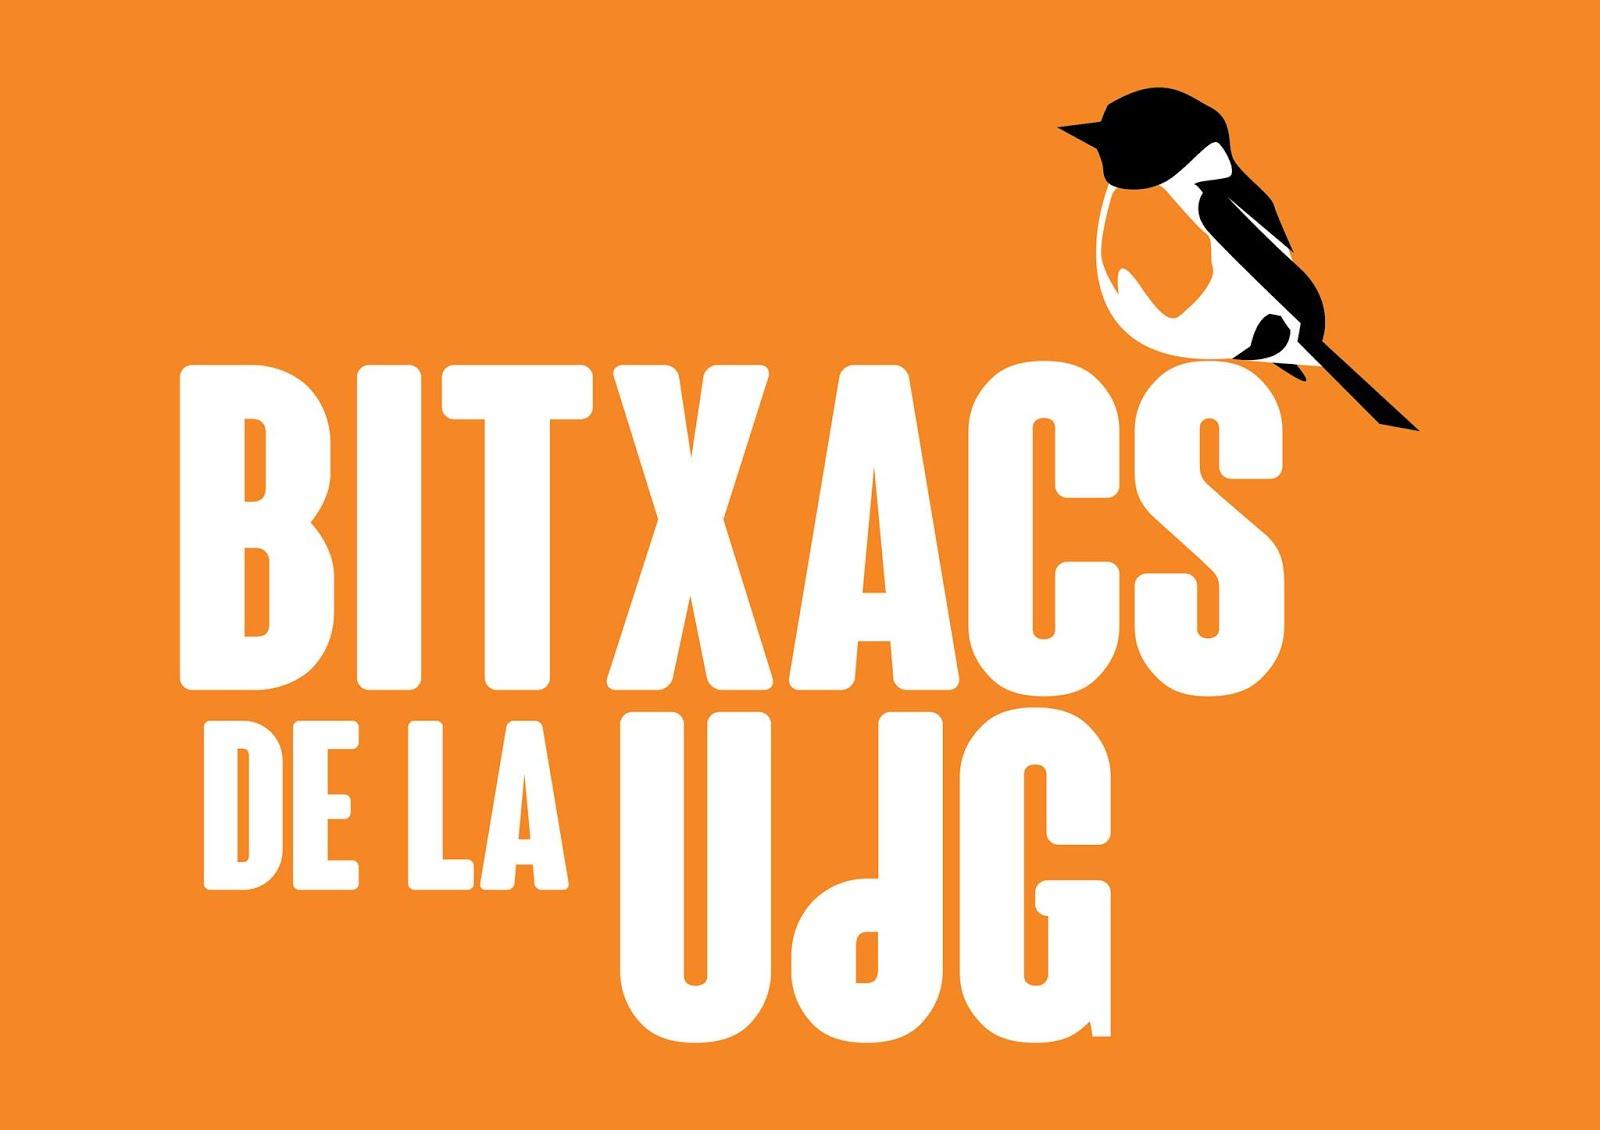 Bitxacs UdG